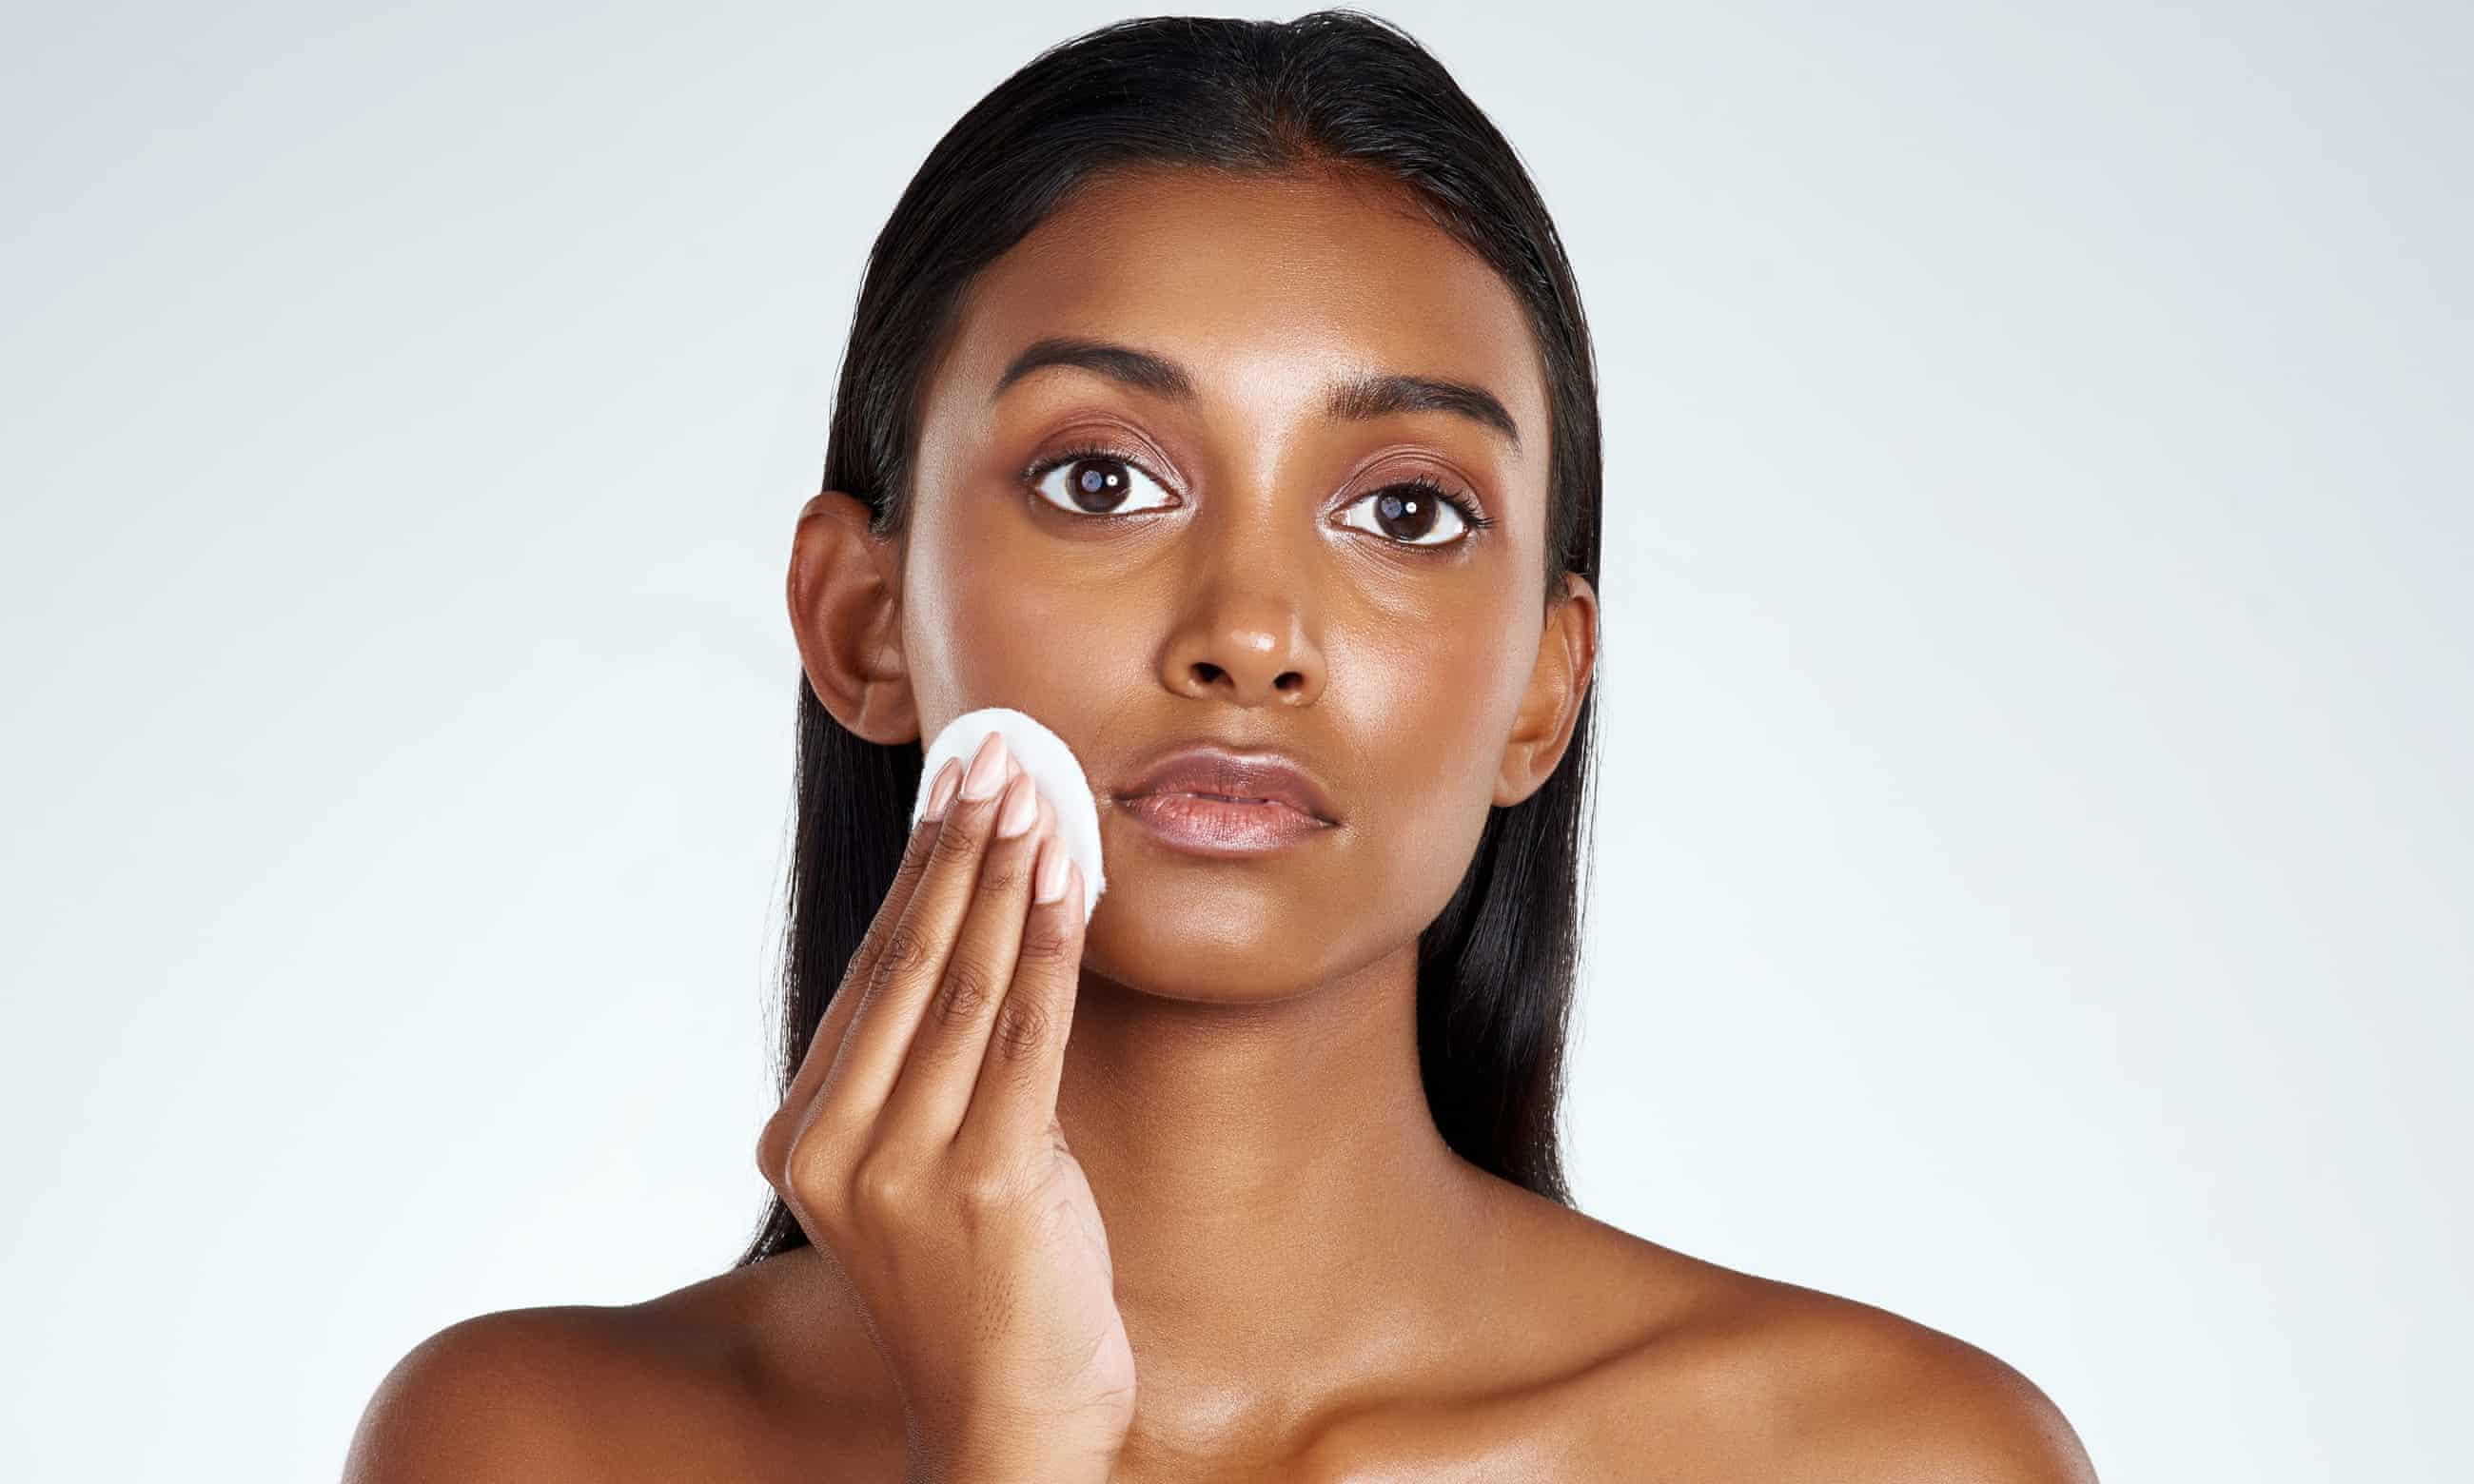 The Guardian: Bare-faced chic - Funmi Fetto's good skin guide